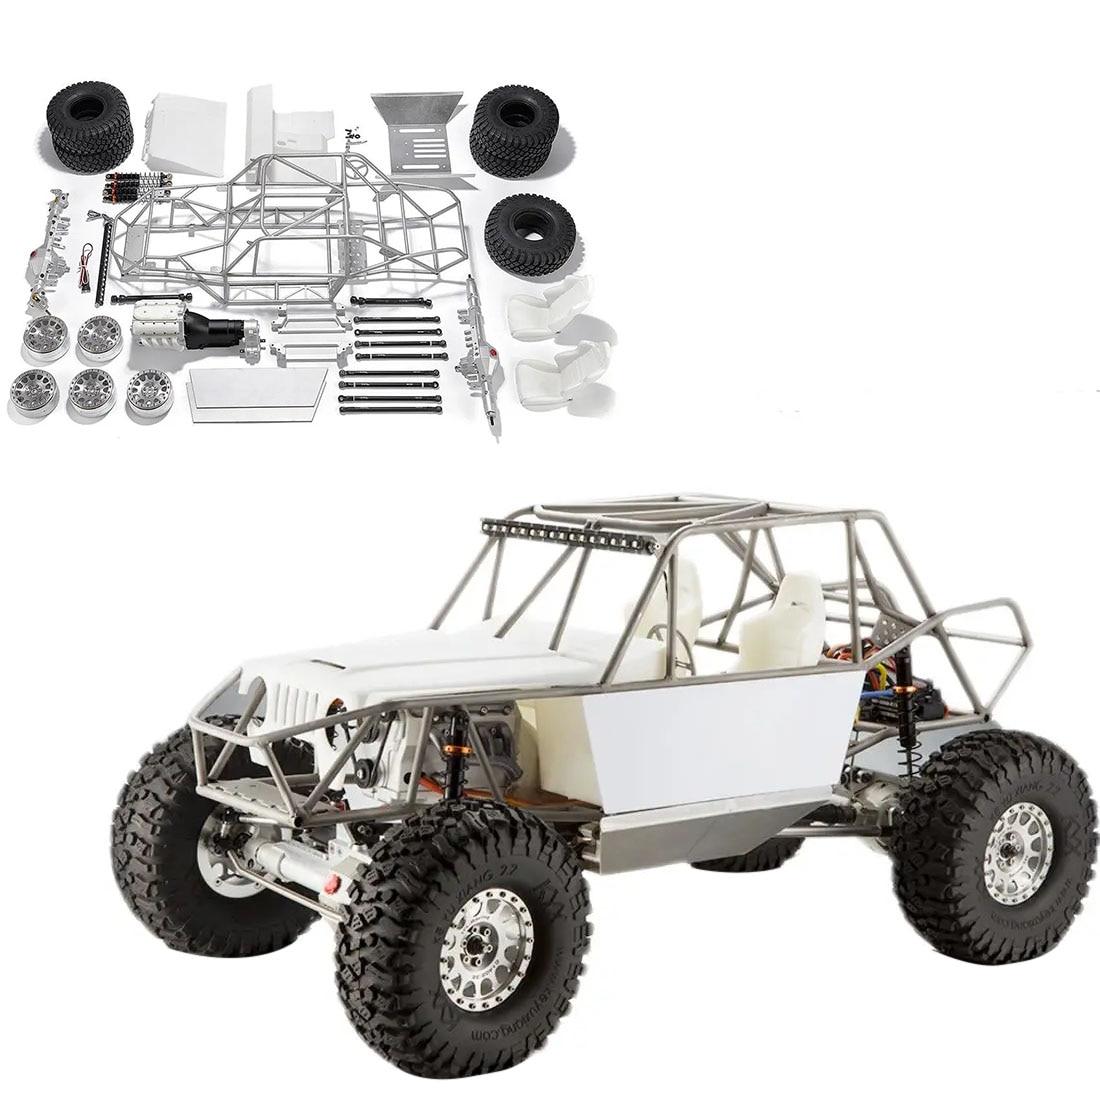 TFL Einhorn C1805 1/10 4WD Voll Metall RC Crawler Auto mit Front Doppel Gang-Keine Malerei KIT Version